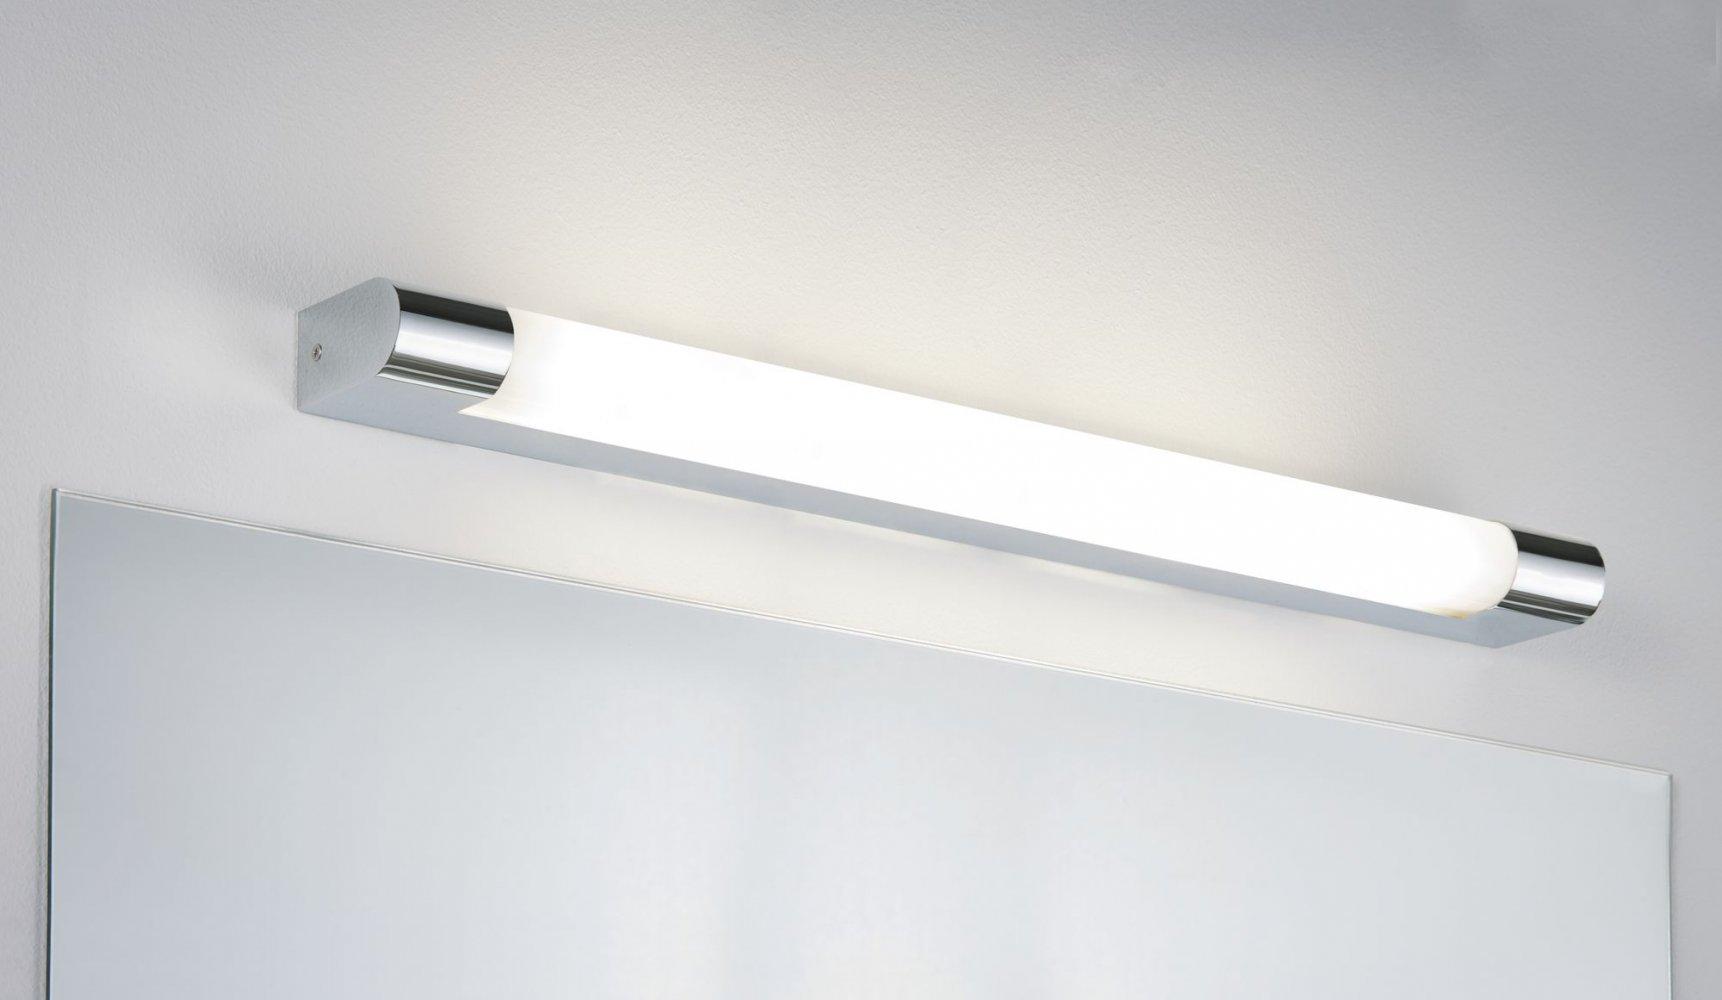 Paulmann No. 20 Spiegelleuchte LED Mizar IP20 Steckdose 20,20W Chrom 20 cm